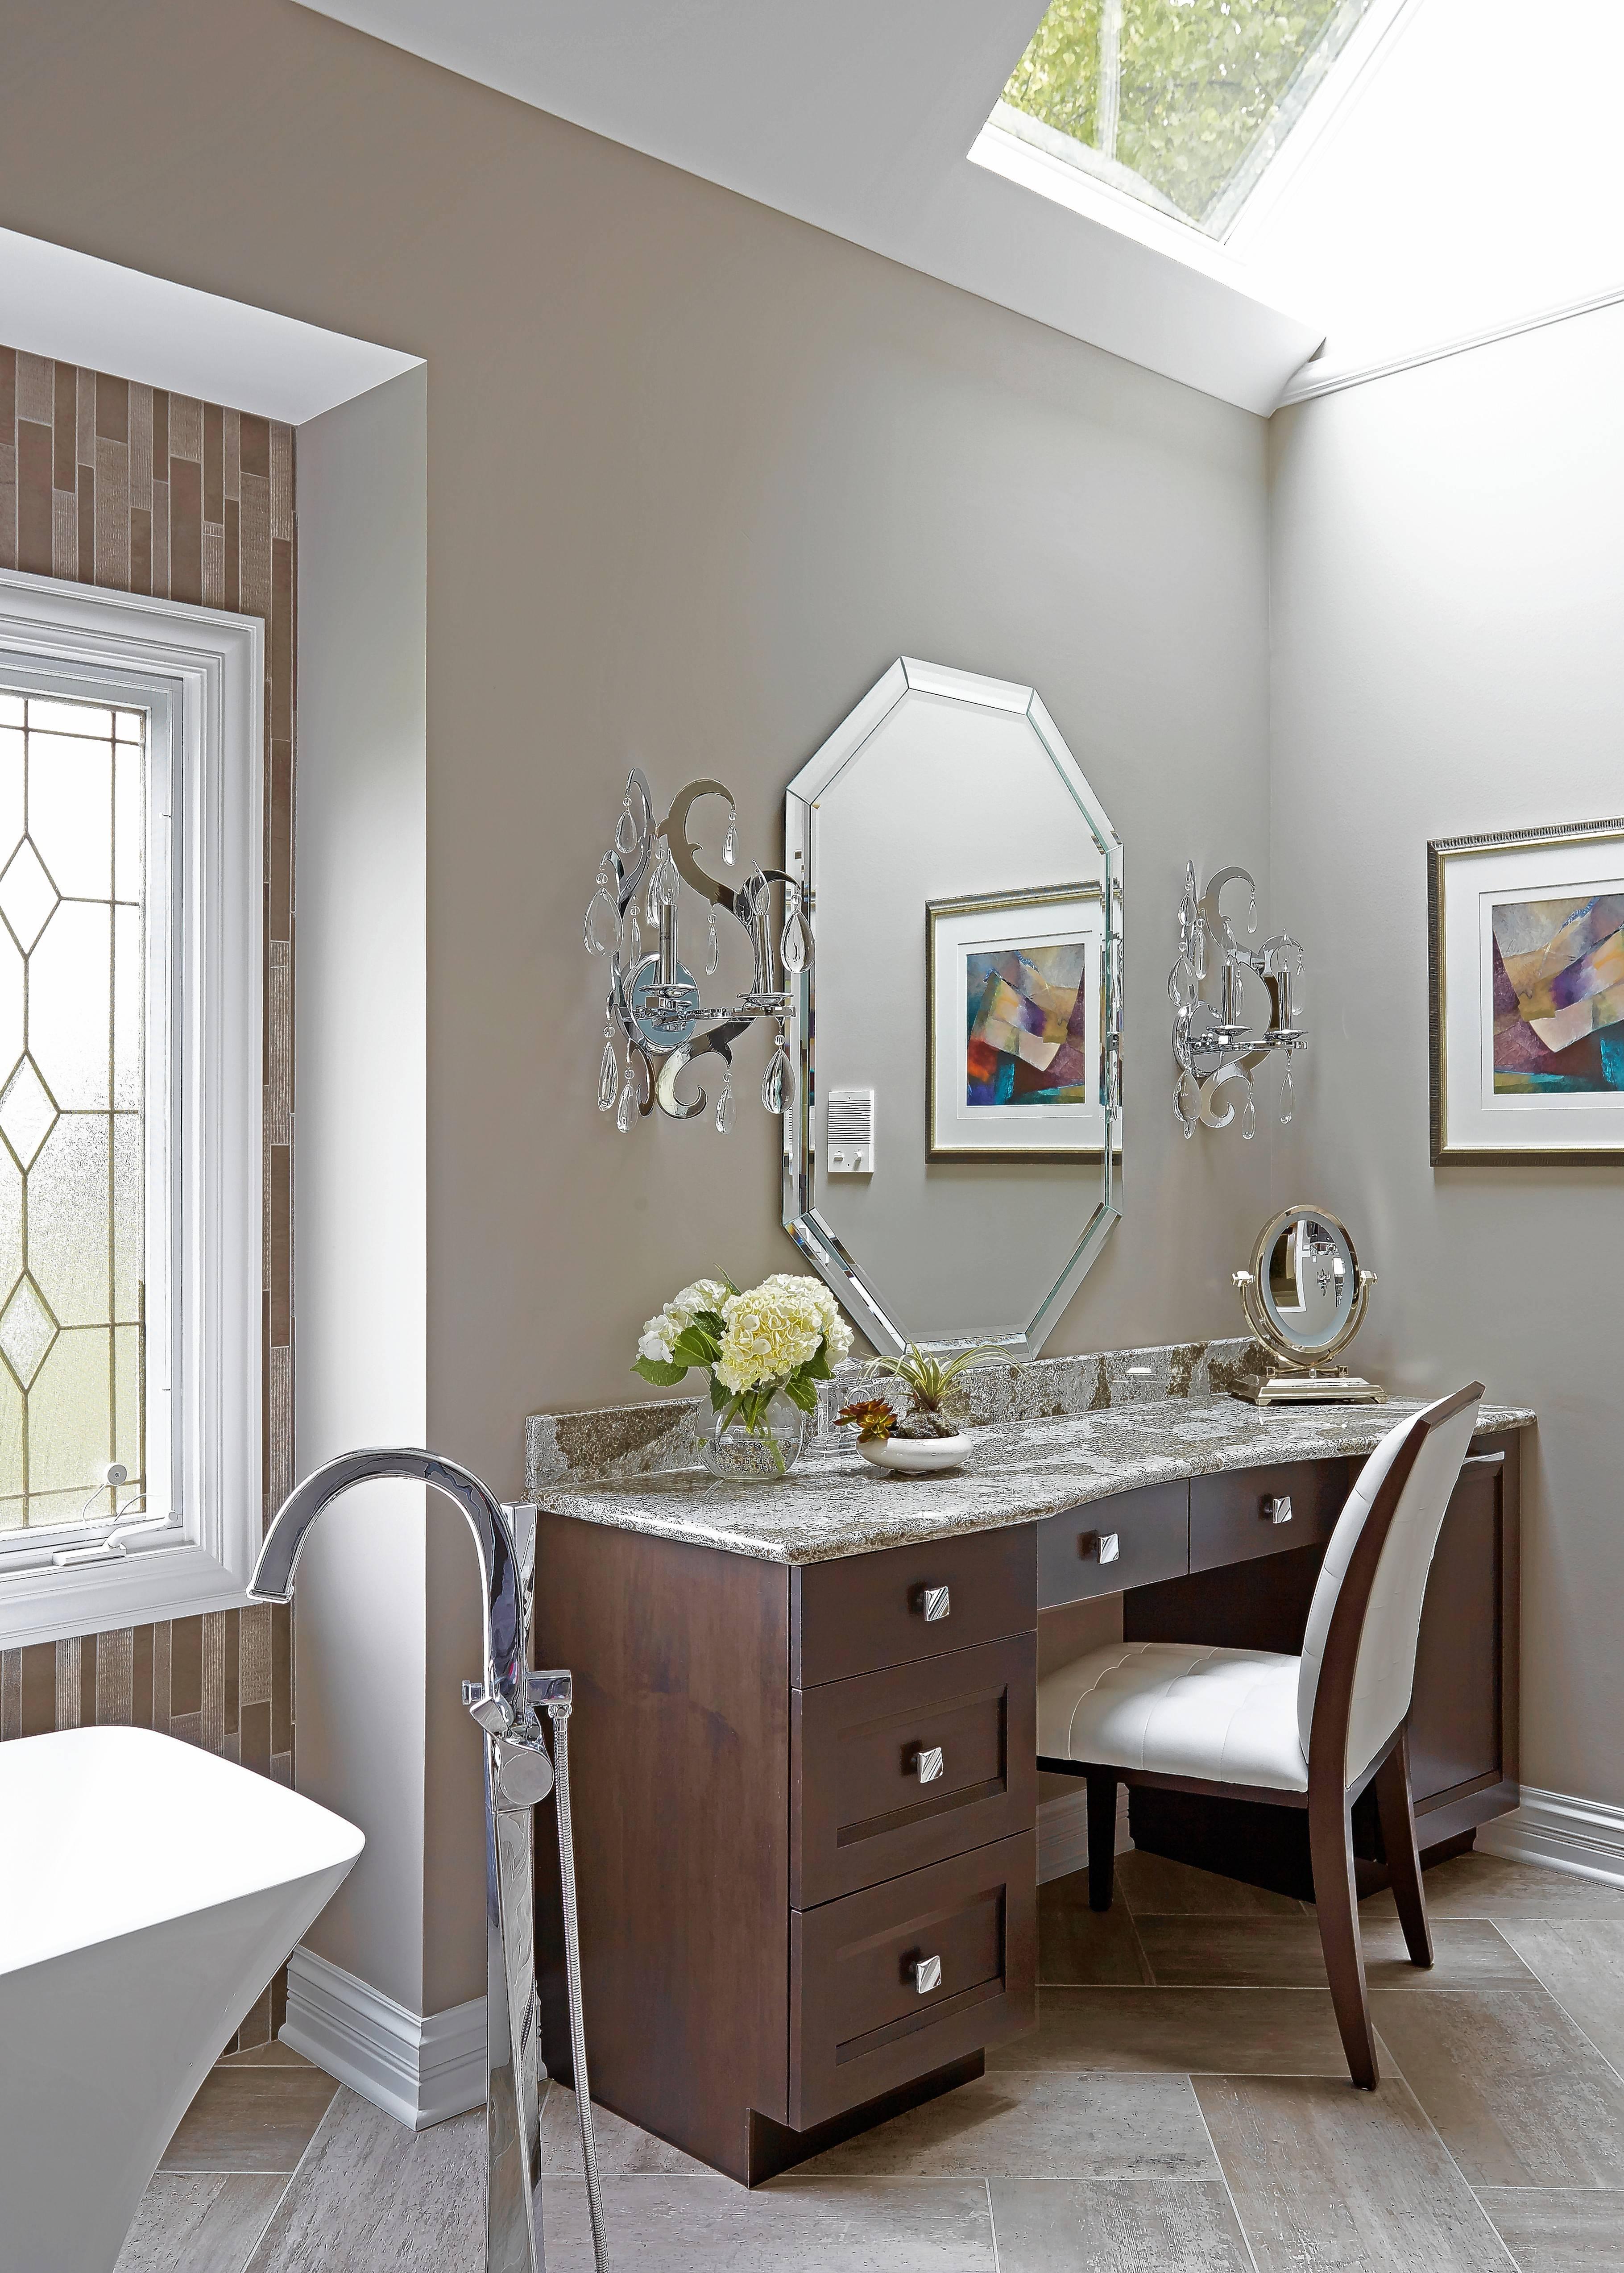 master kitchen and bath - zitzat